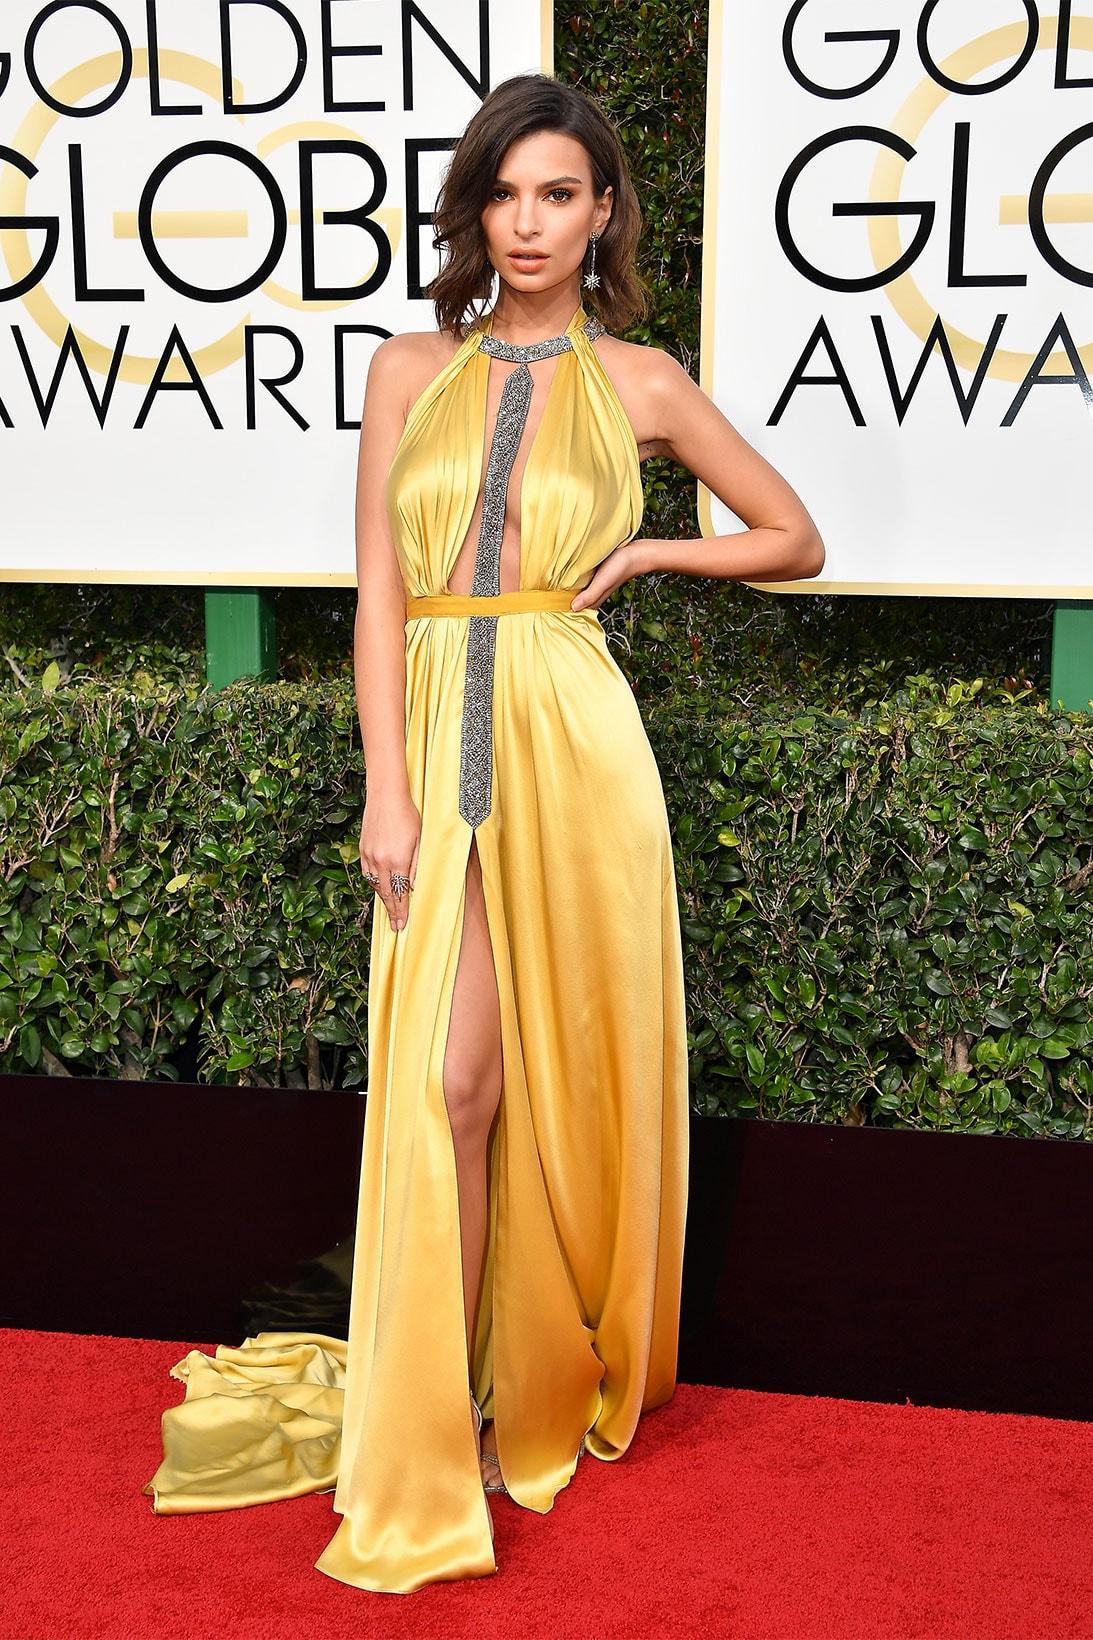 golden globes awards best most iconic looks dresses red carpet celebrity style beyonce julia roberts sarah jessica parker sjp